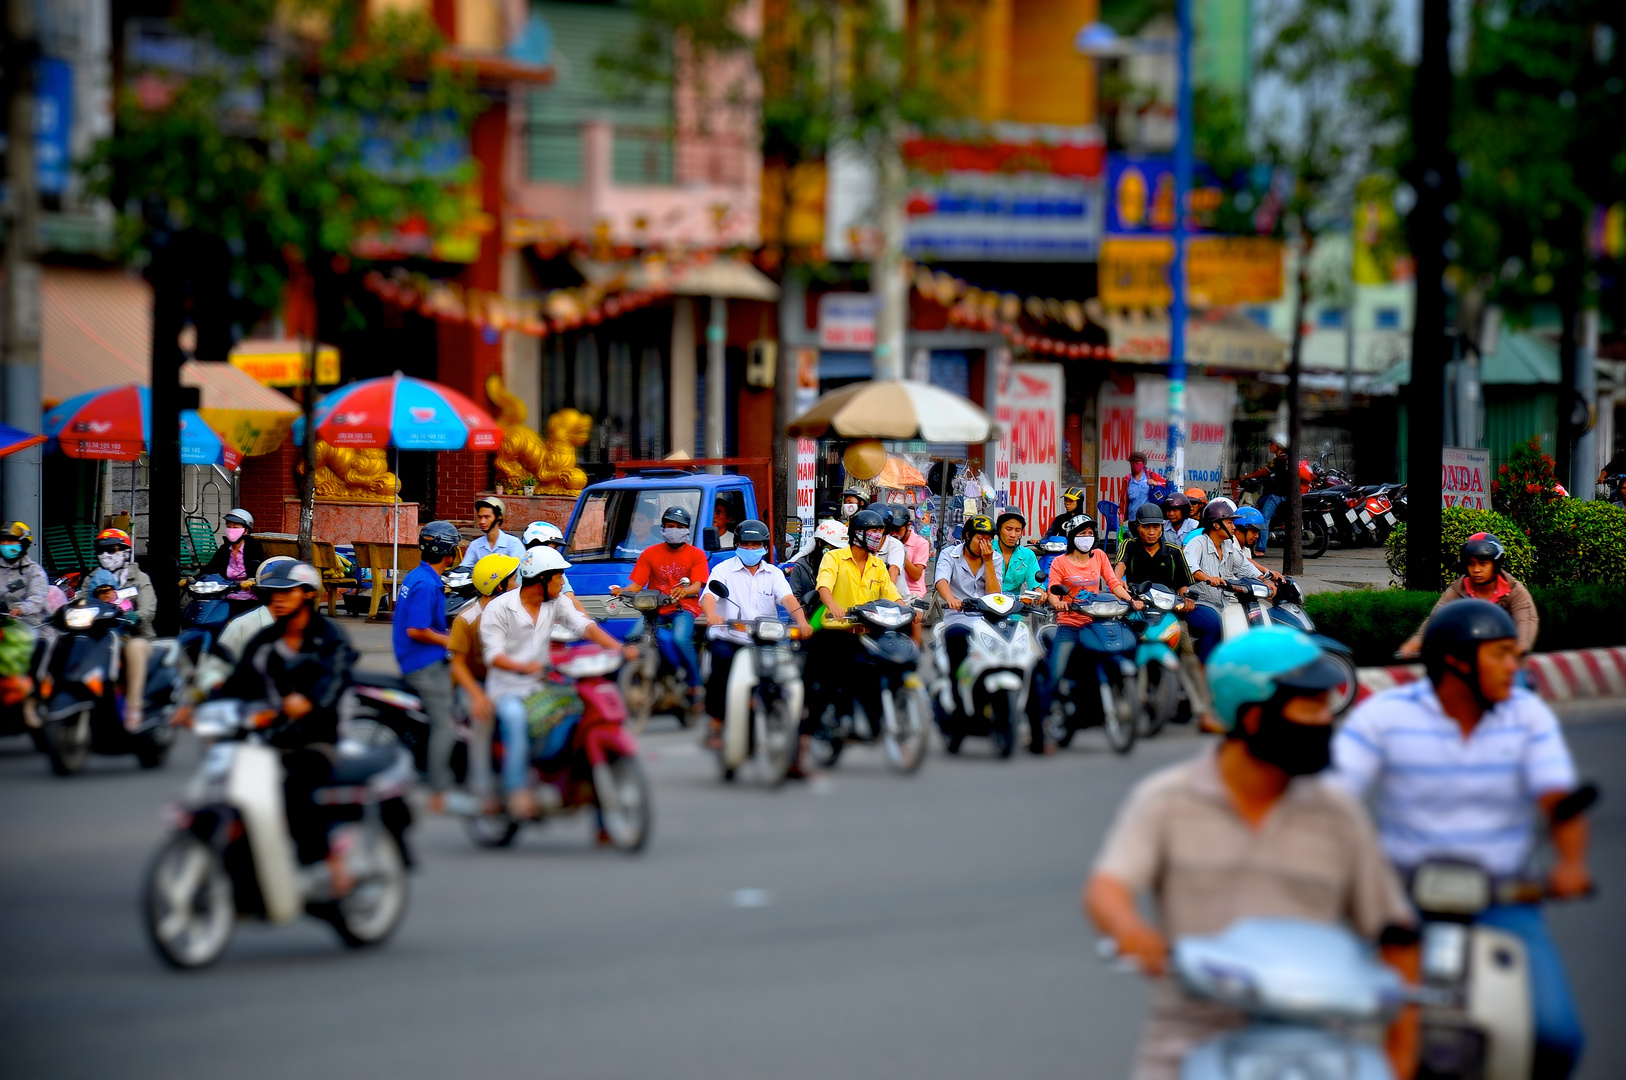 Stadtimpression Saigon - TiltShift Bearbeitung